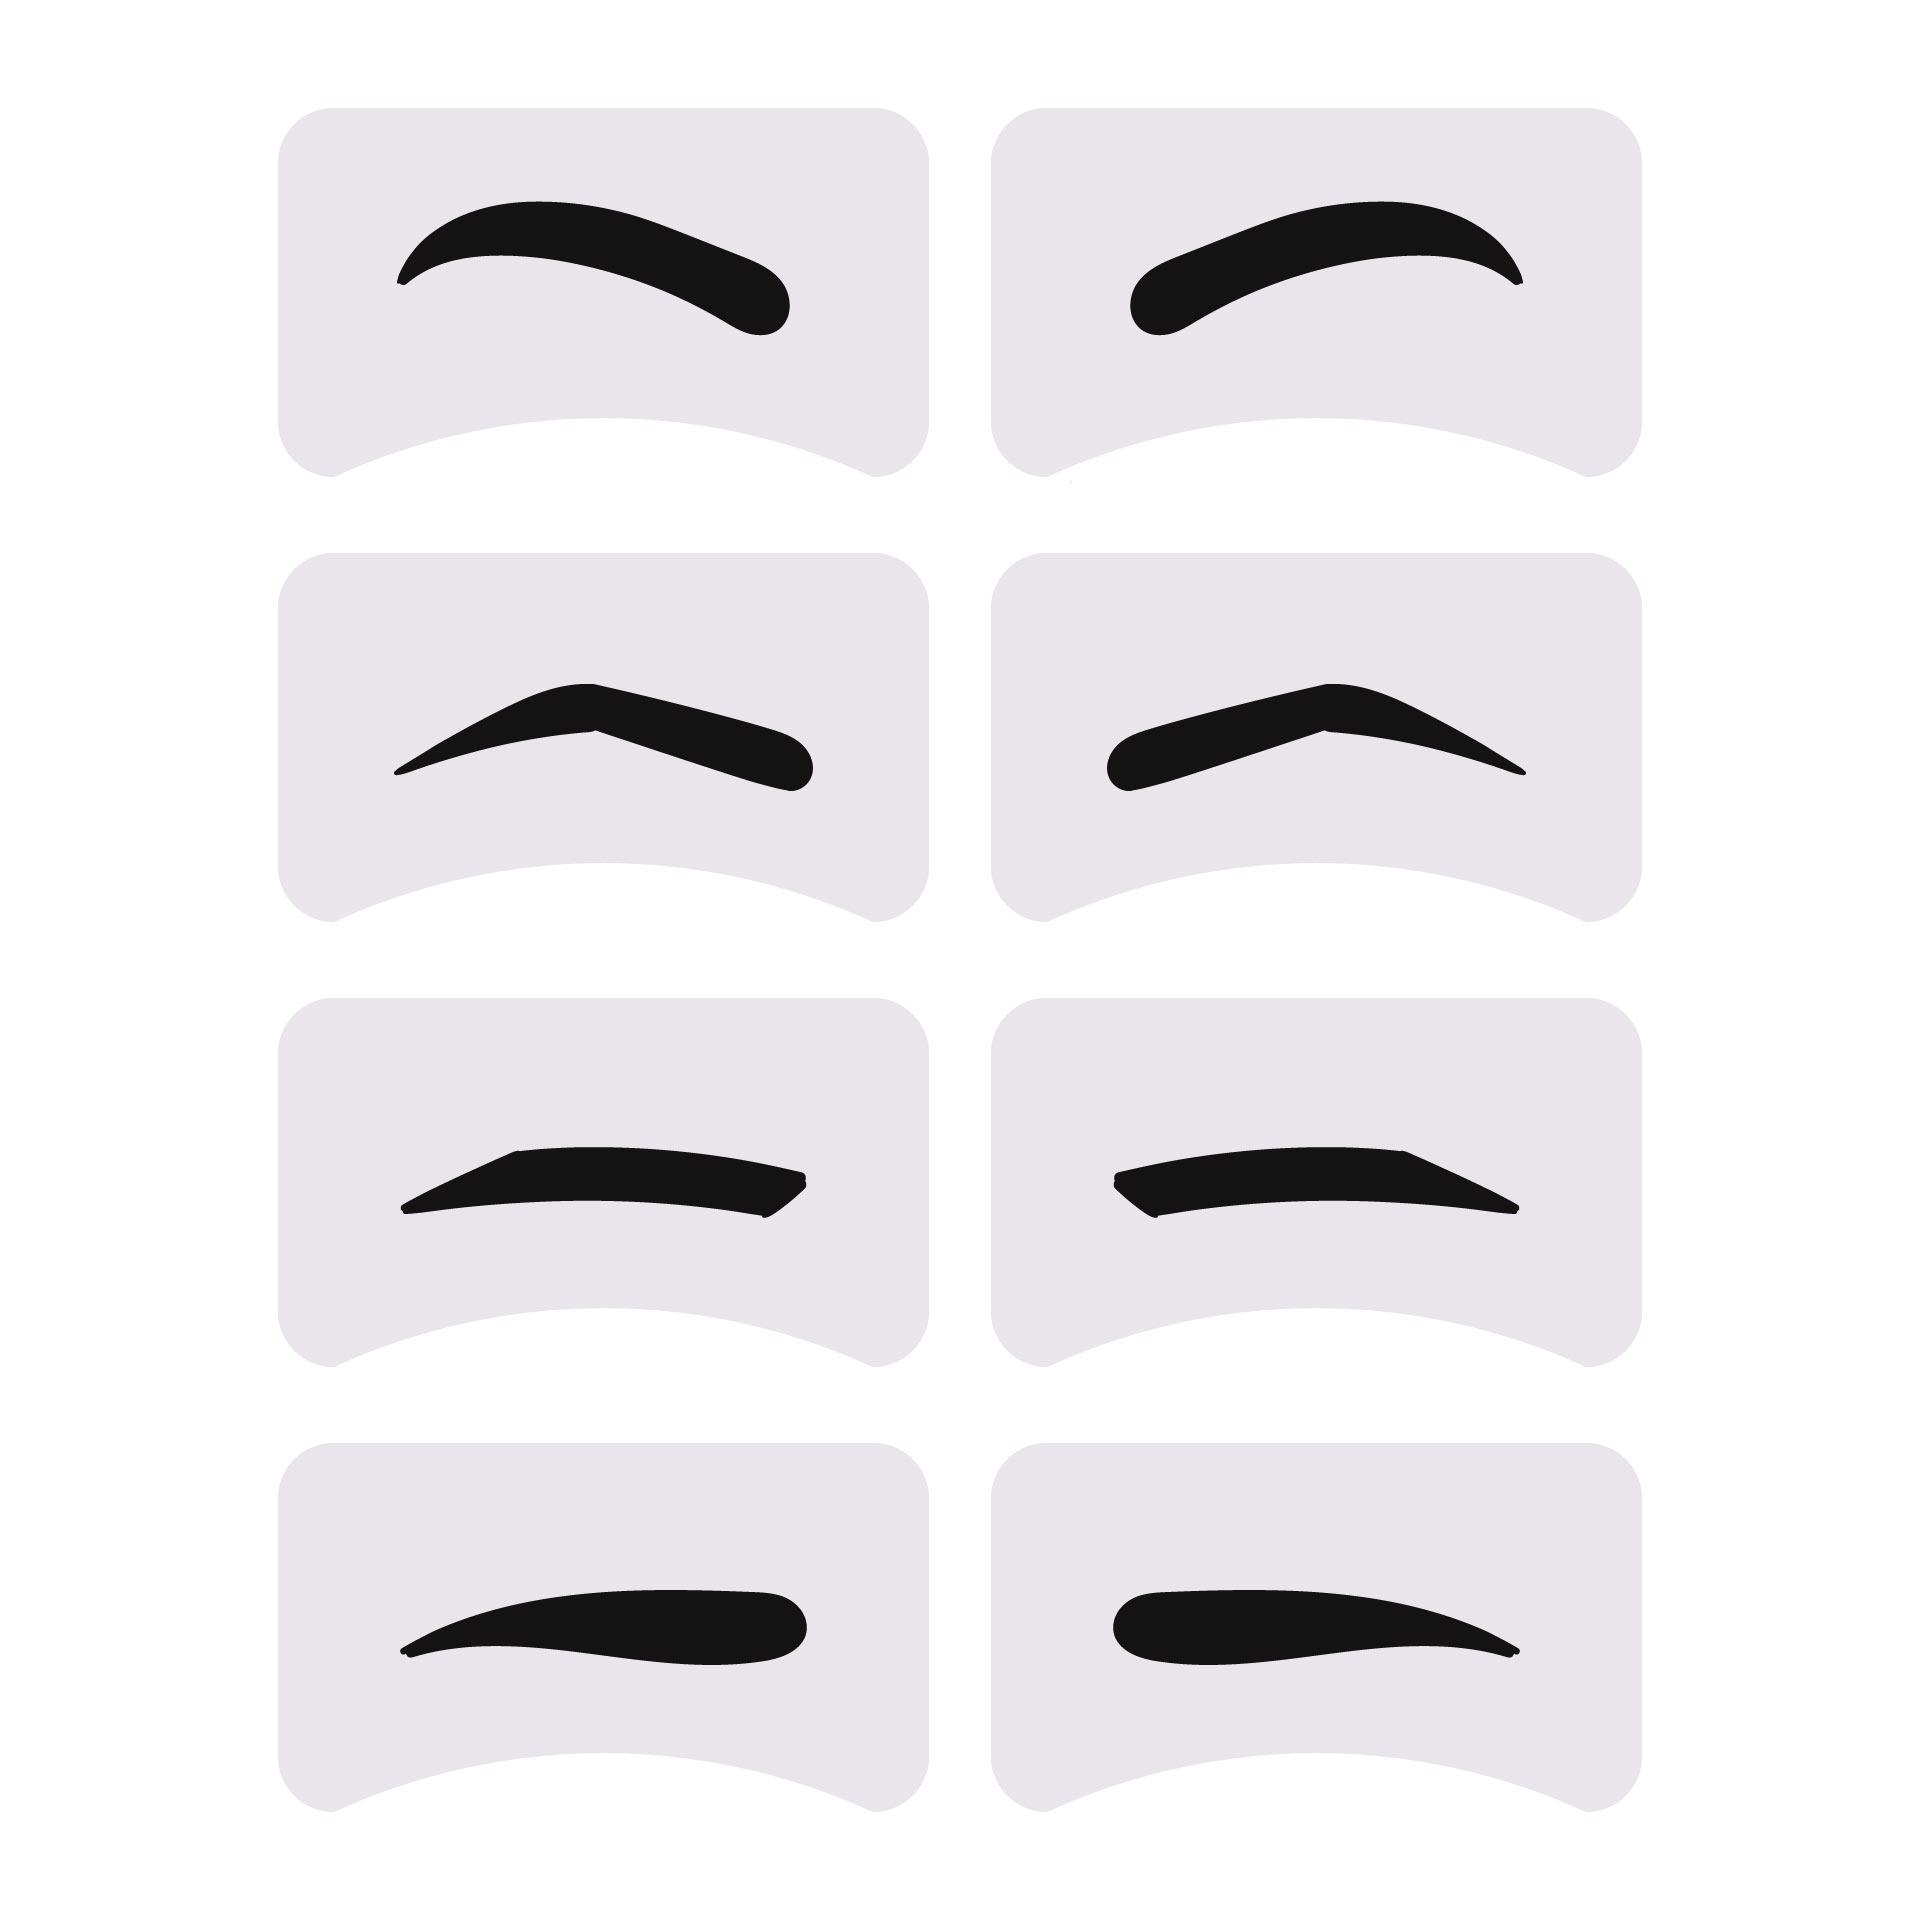 Eyebrow Stencil Grooming Shaper Template Makeup Tools